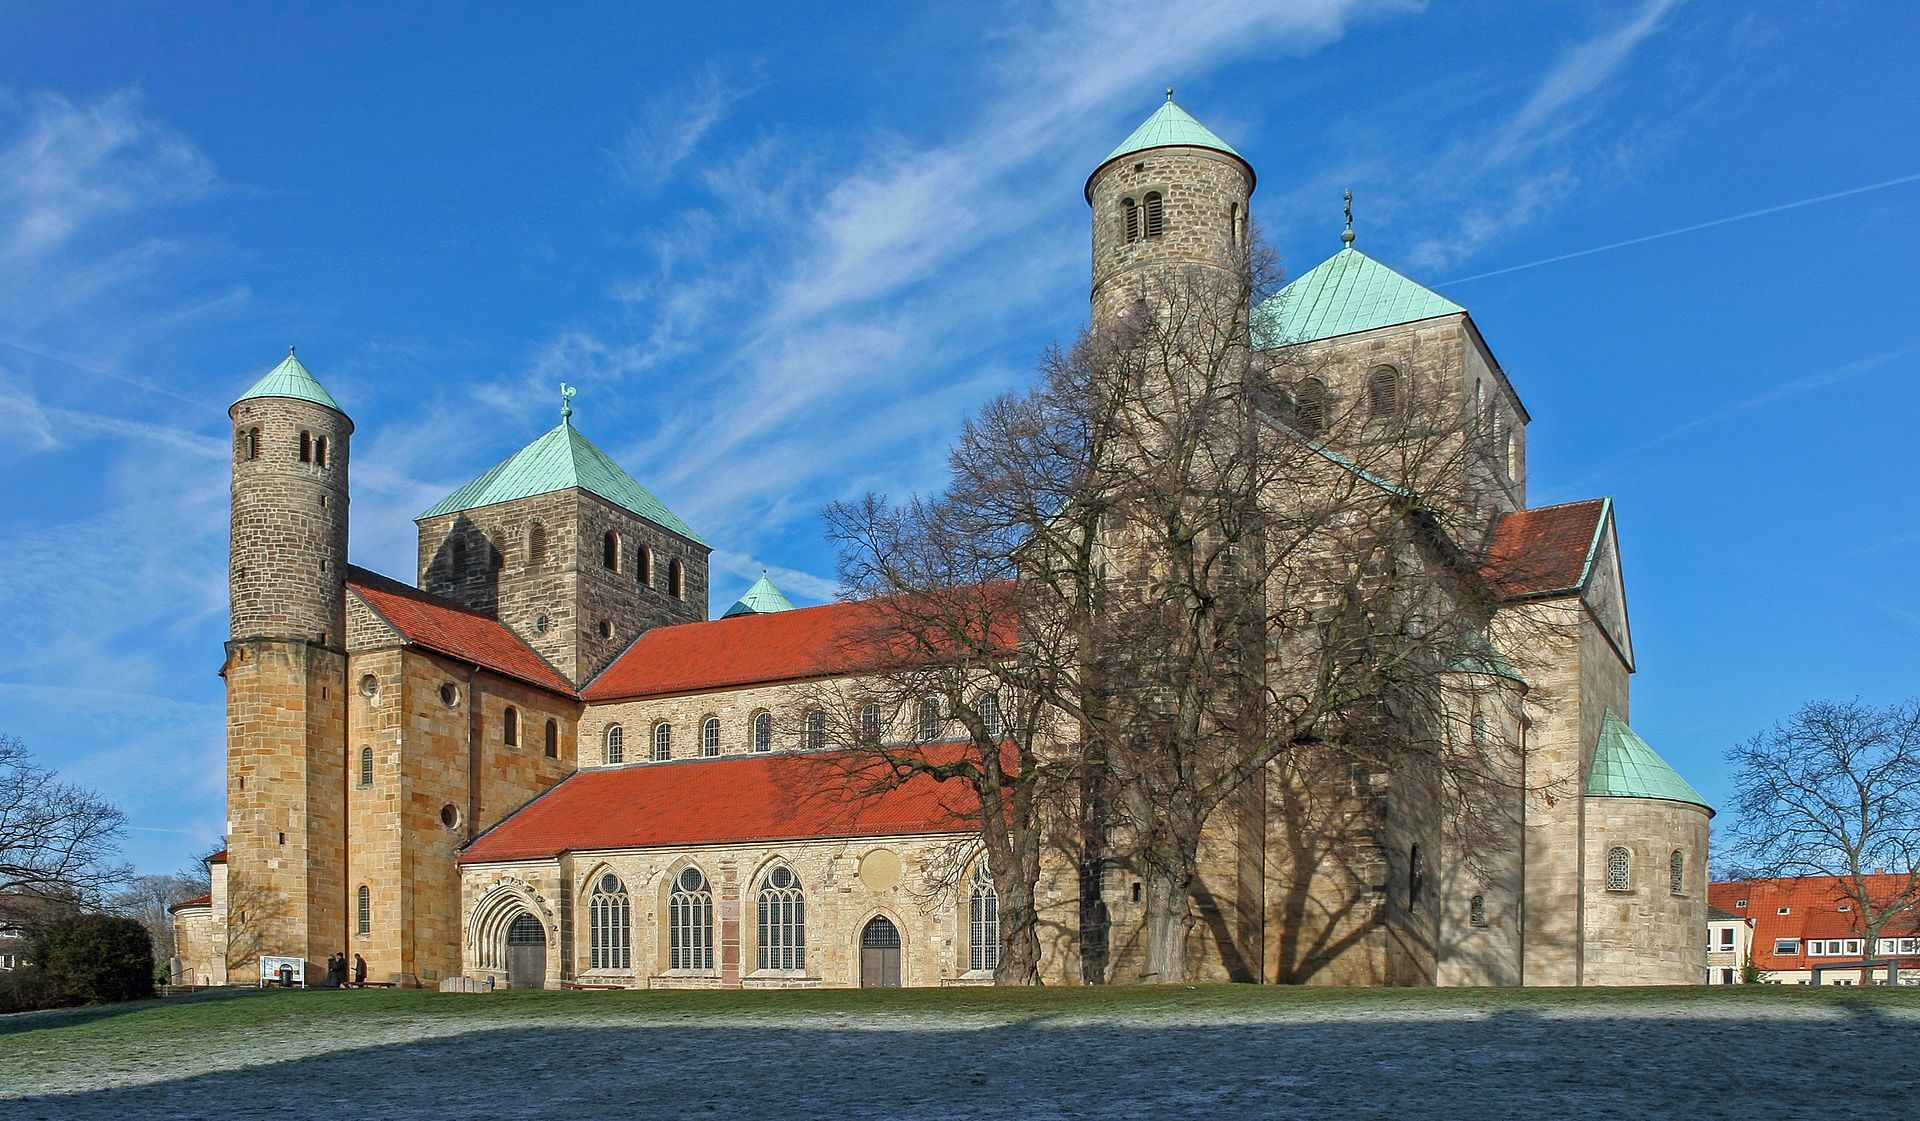 Burg Hildeshof